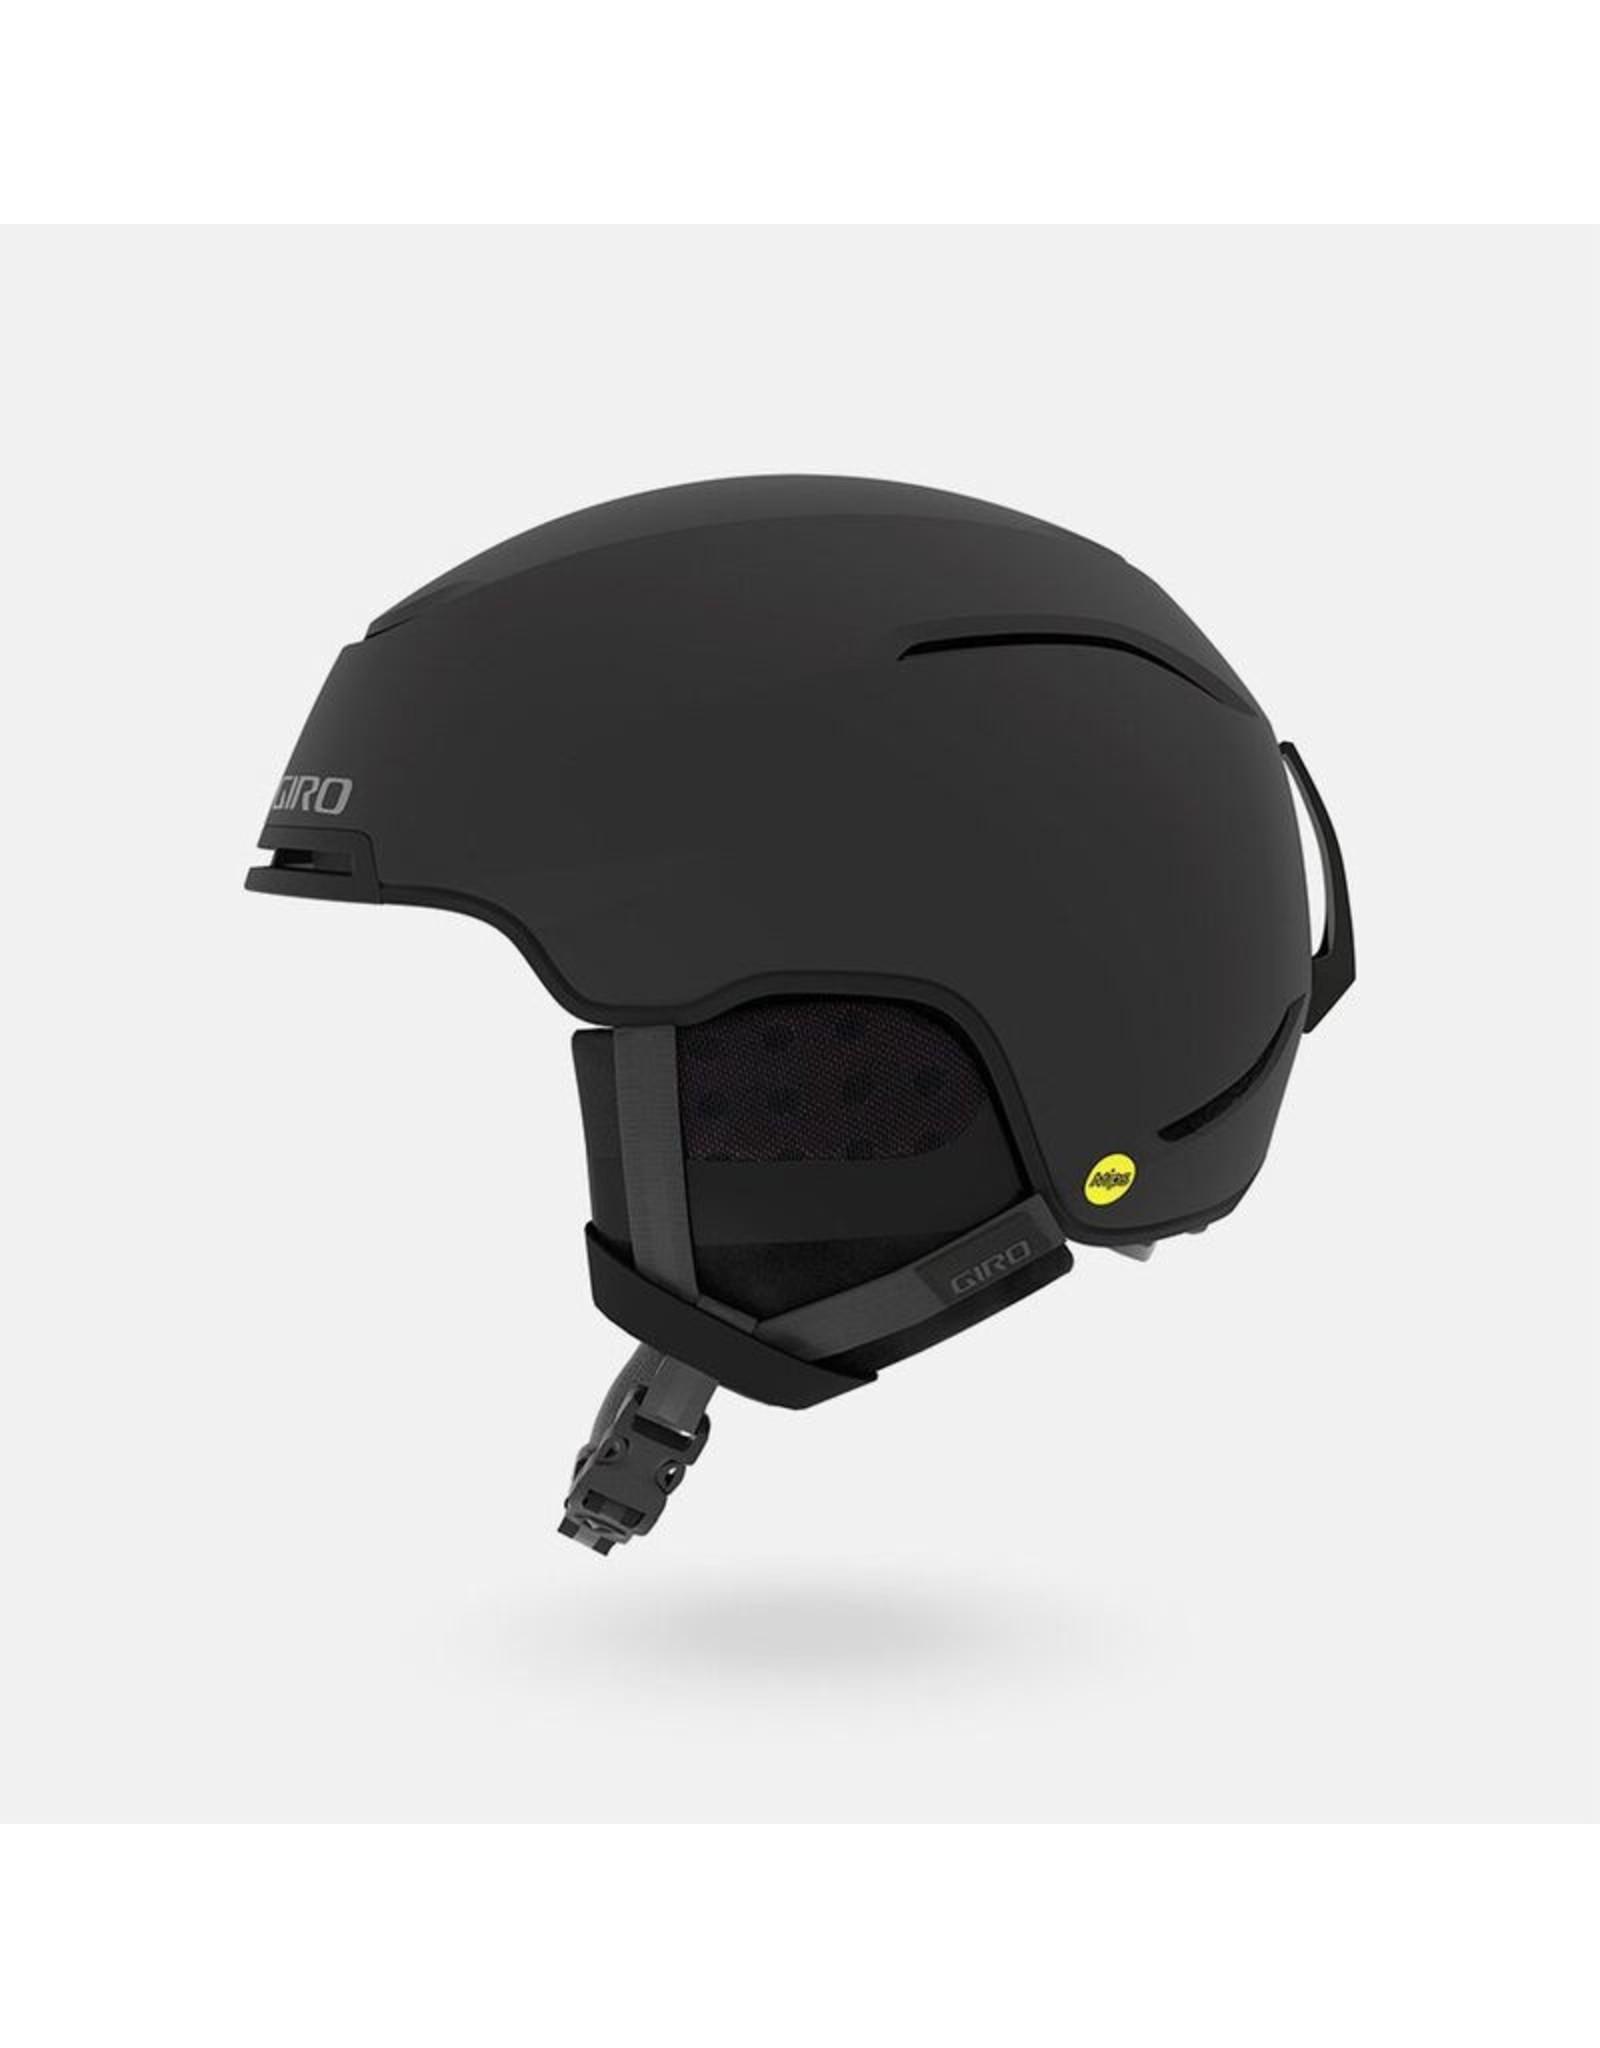 Giro Giro Terra MIPS Helmet